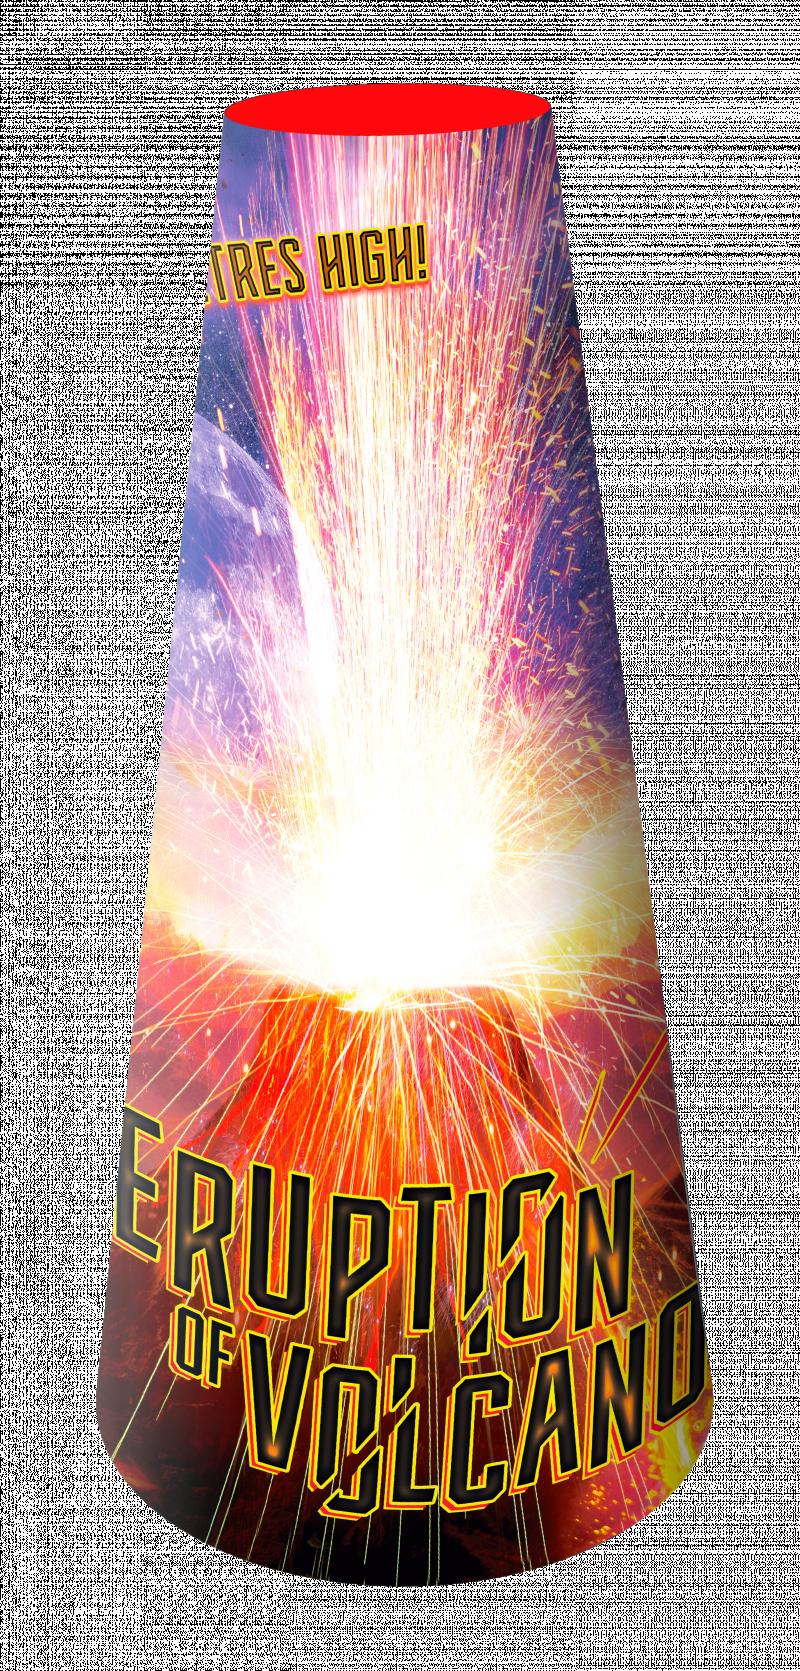 Eruption of Vulcano